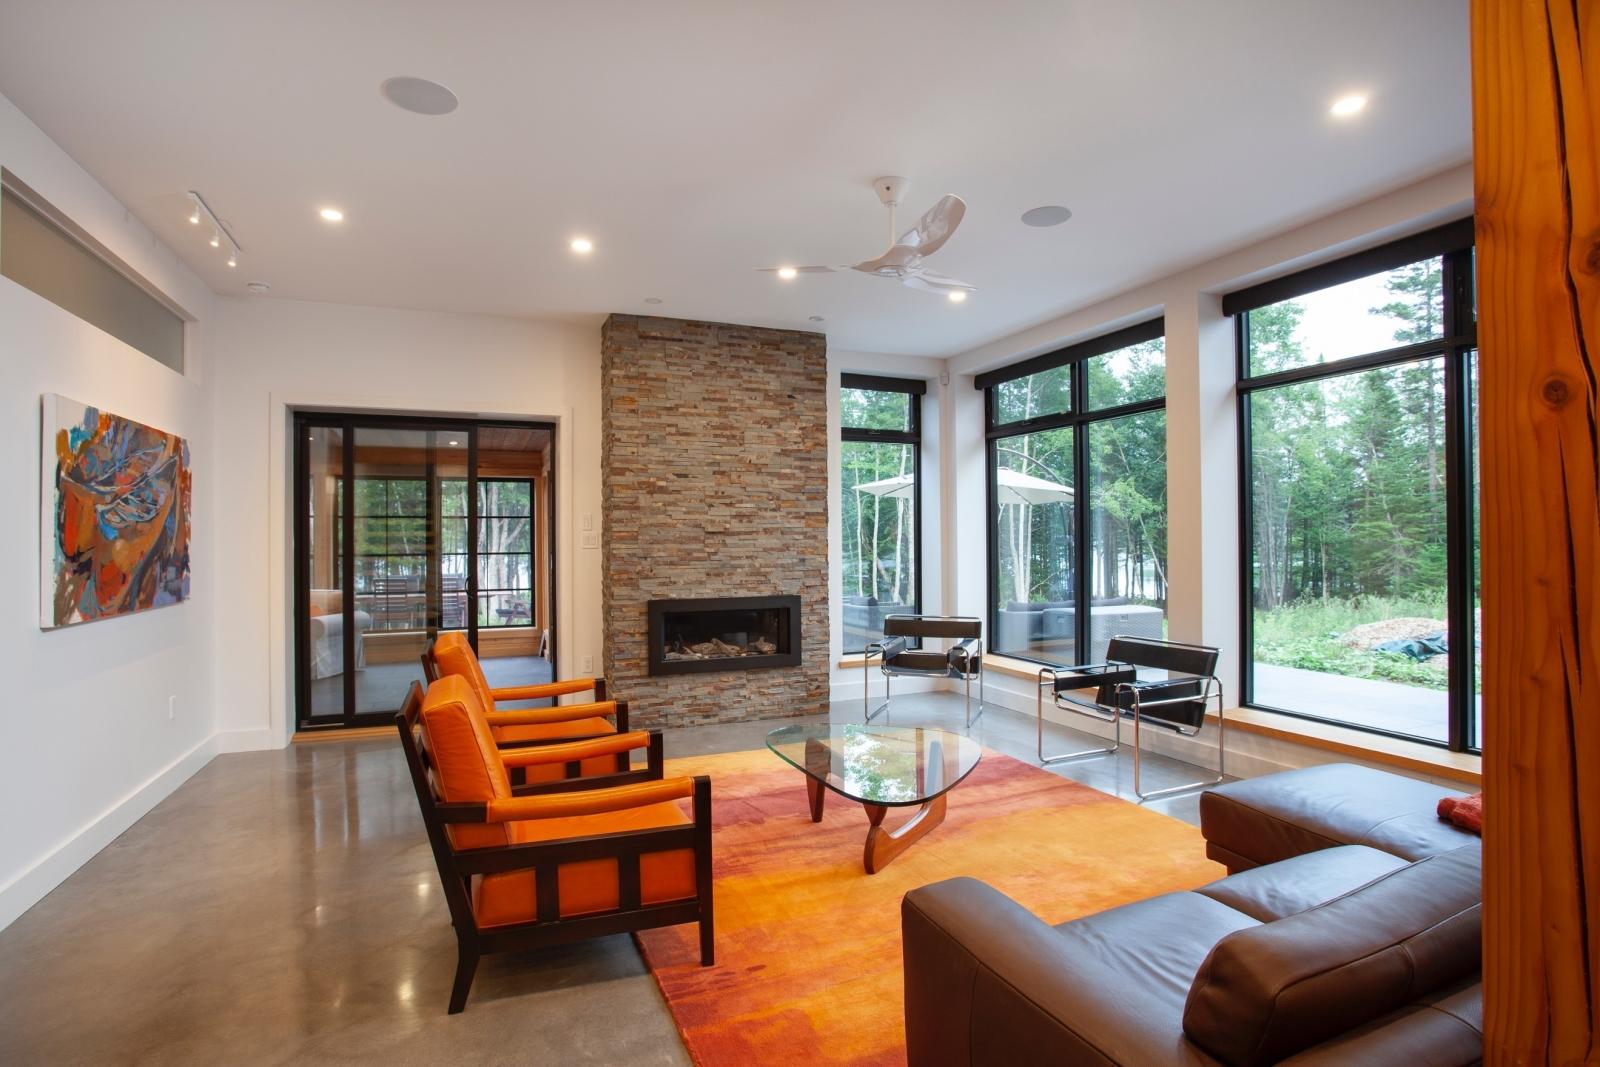 Best Practices In Net Zero House Design Hpb Magazine